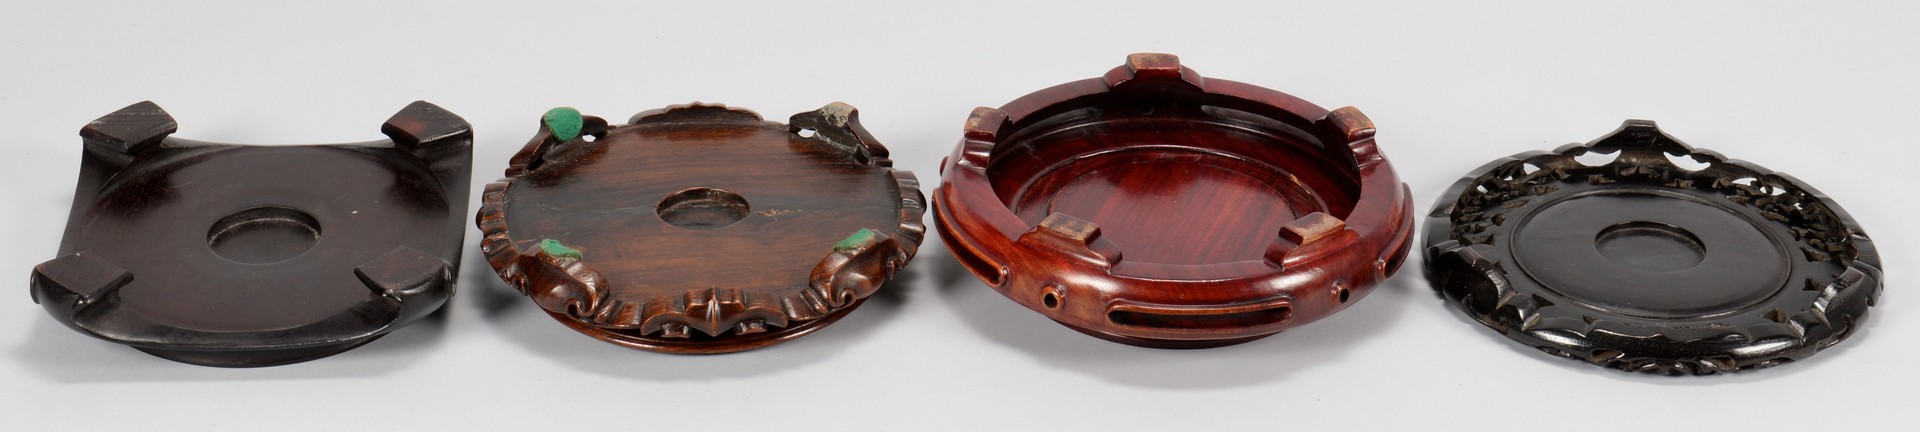 Lot 762: Group of 16 Assorted Asian & European Hardwood Sta